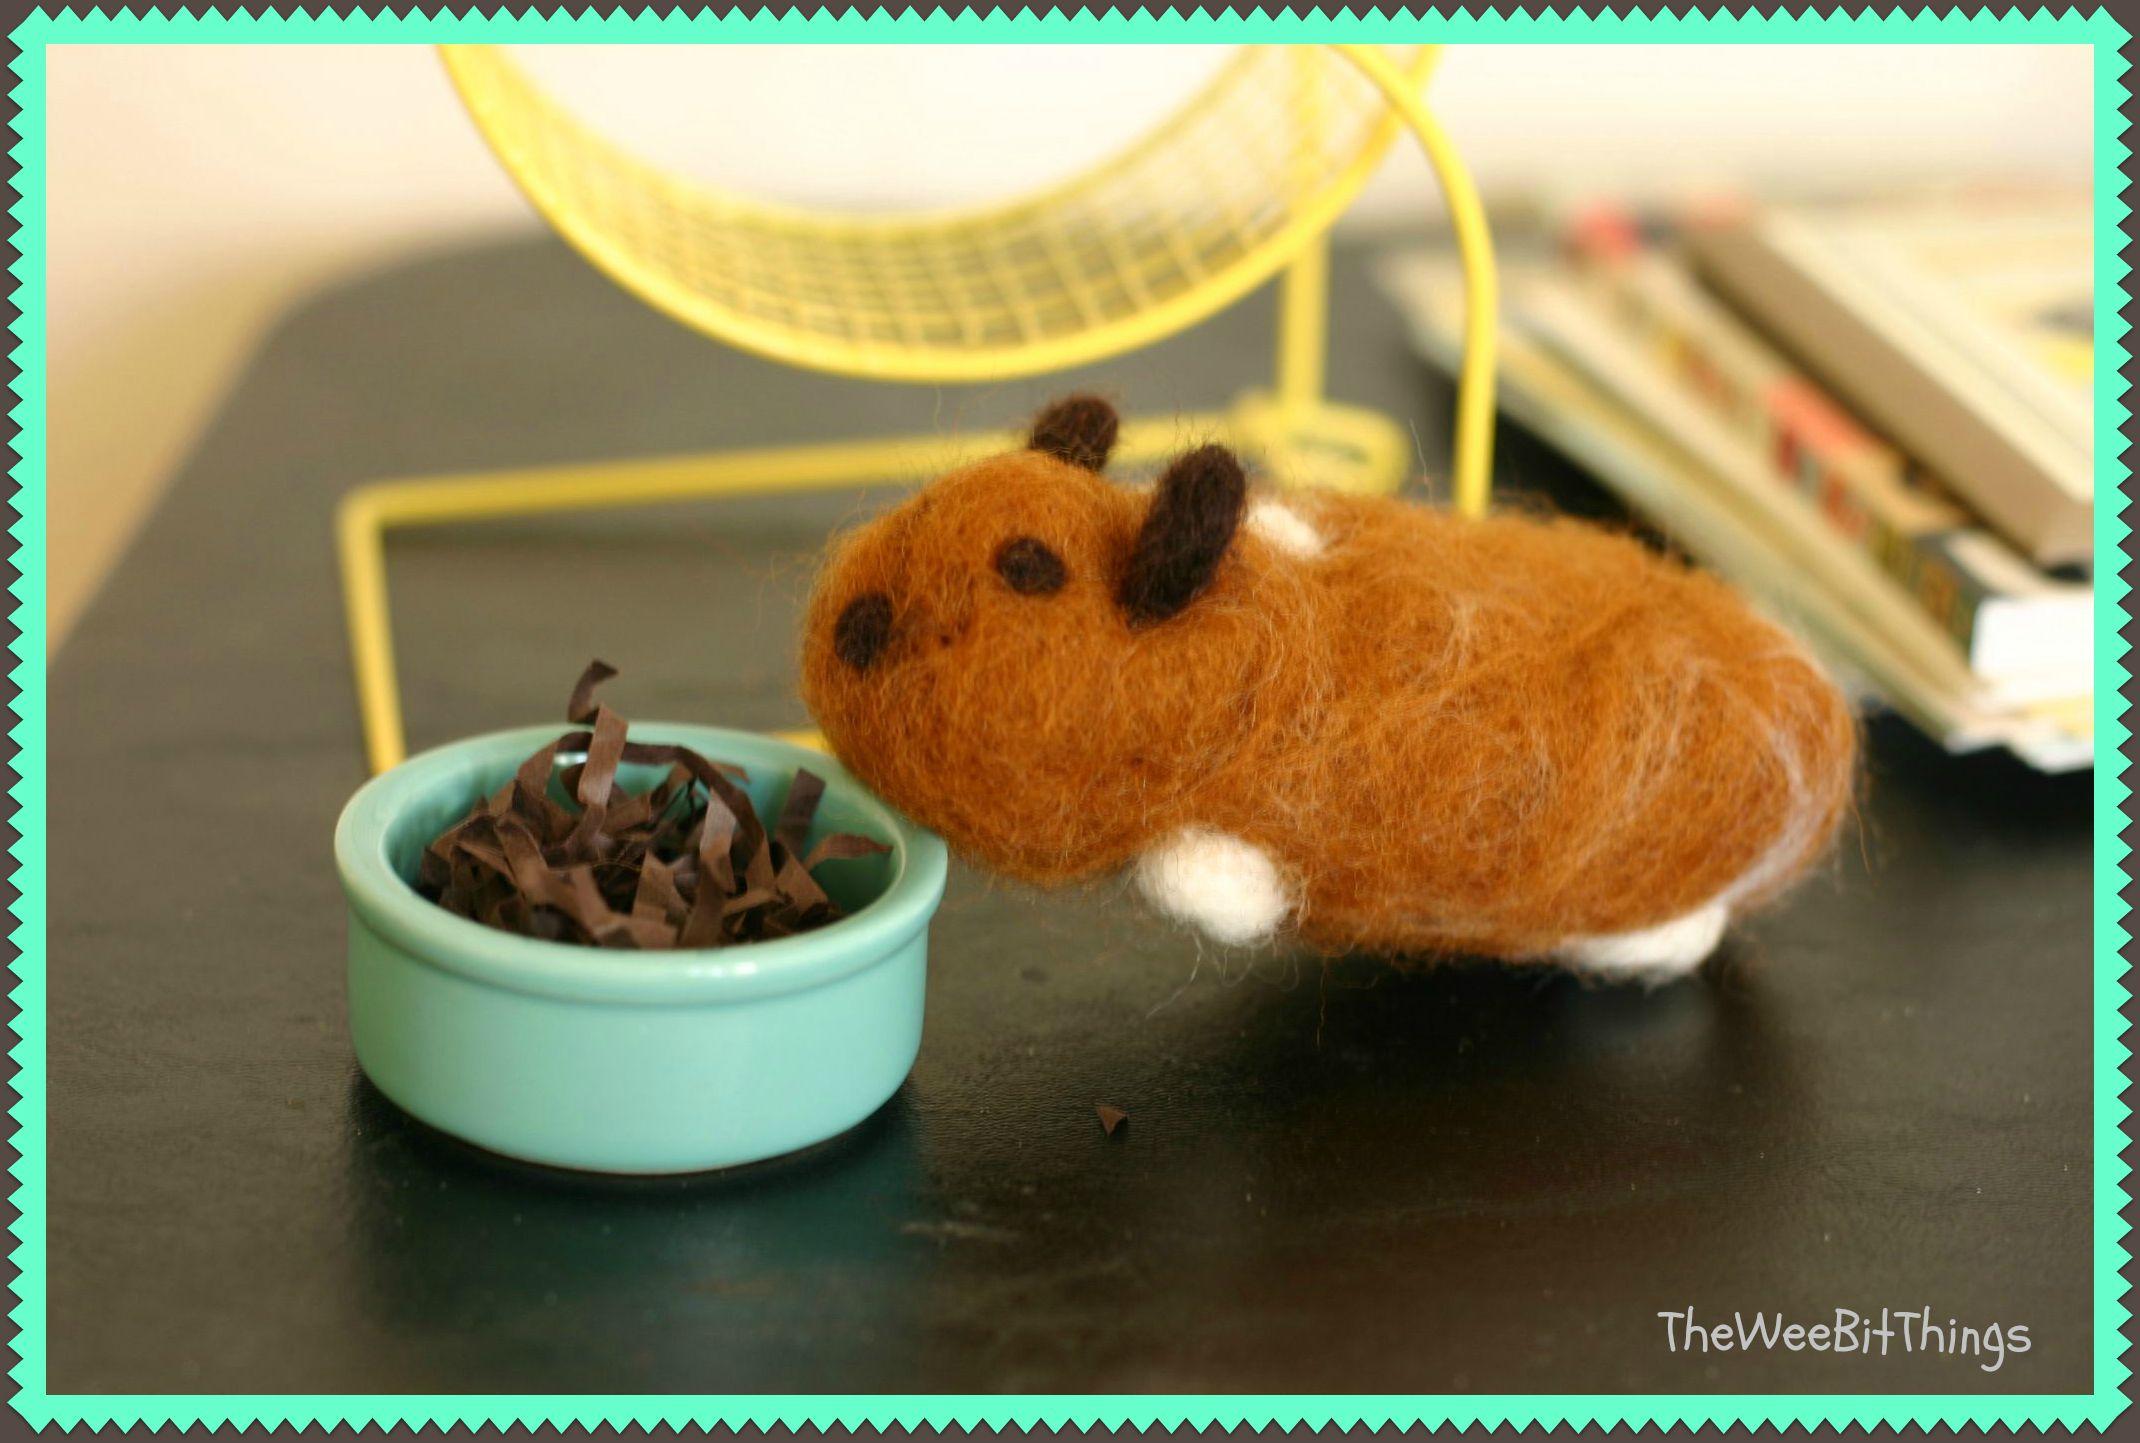 Image of handmade wool felt hamster eating out of pretend food bowl